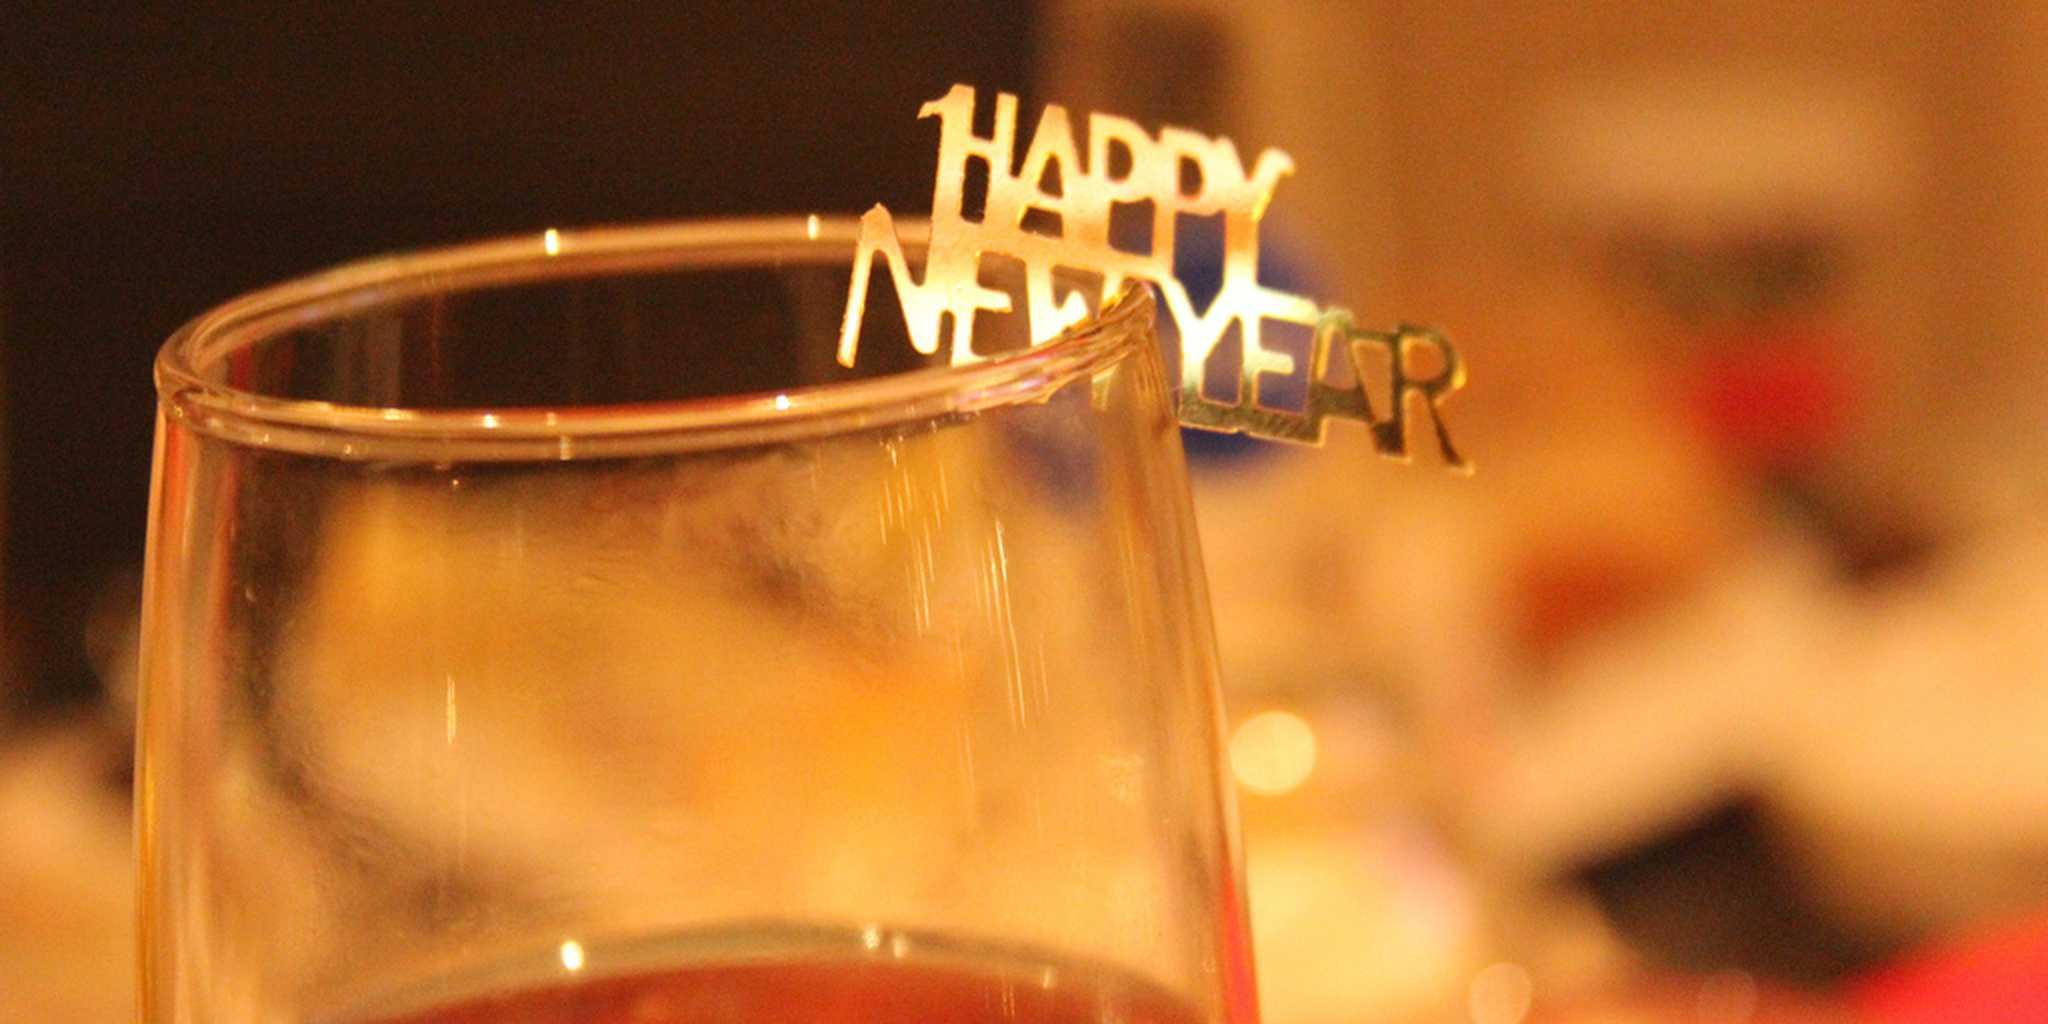 Happy New Year Confetti on Glass